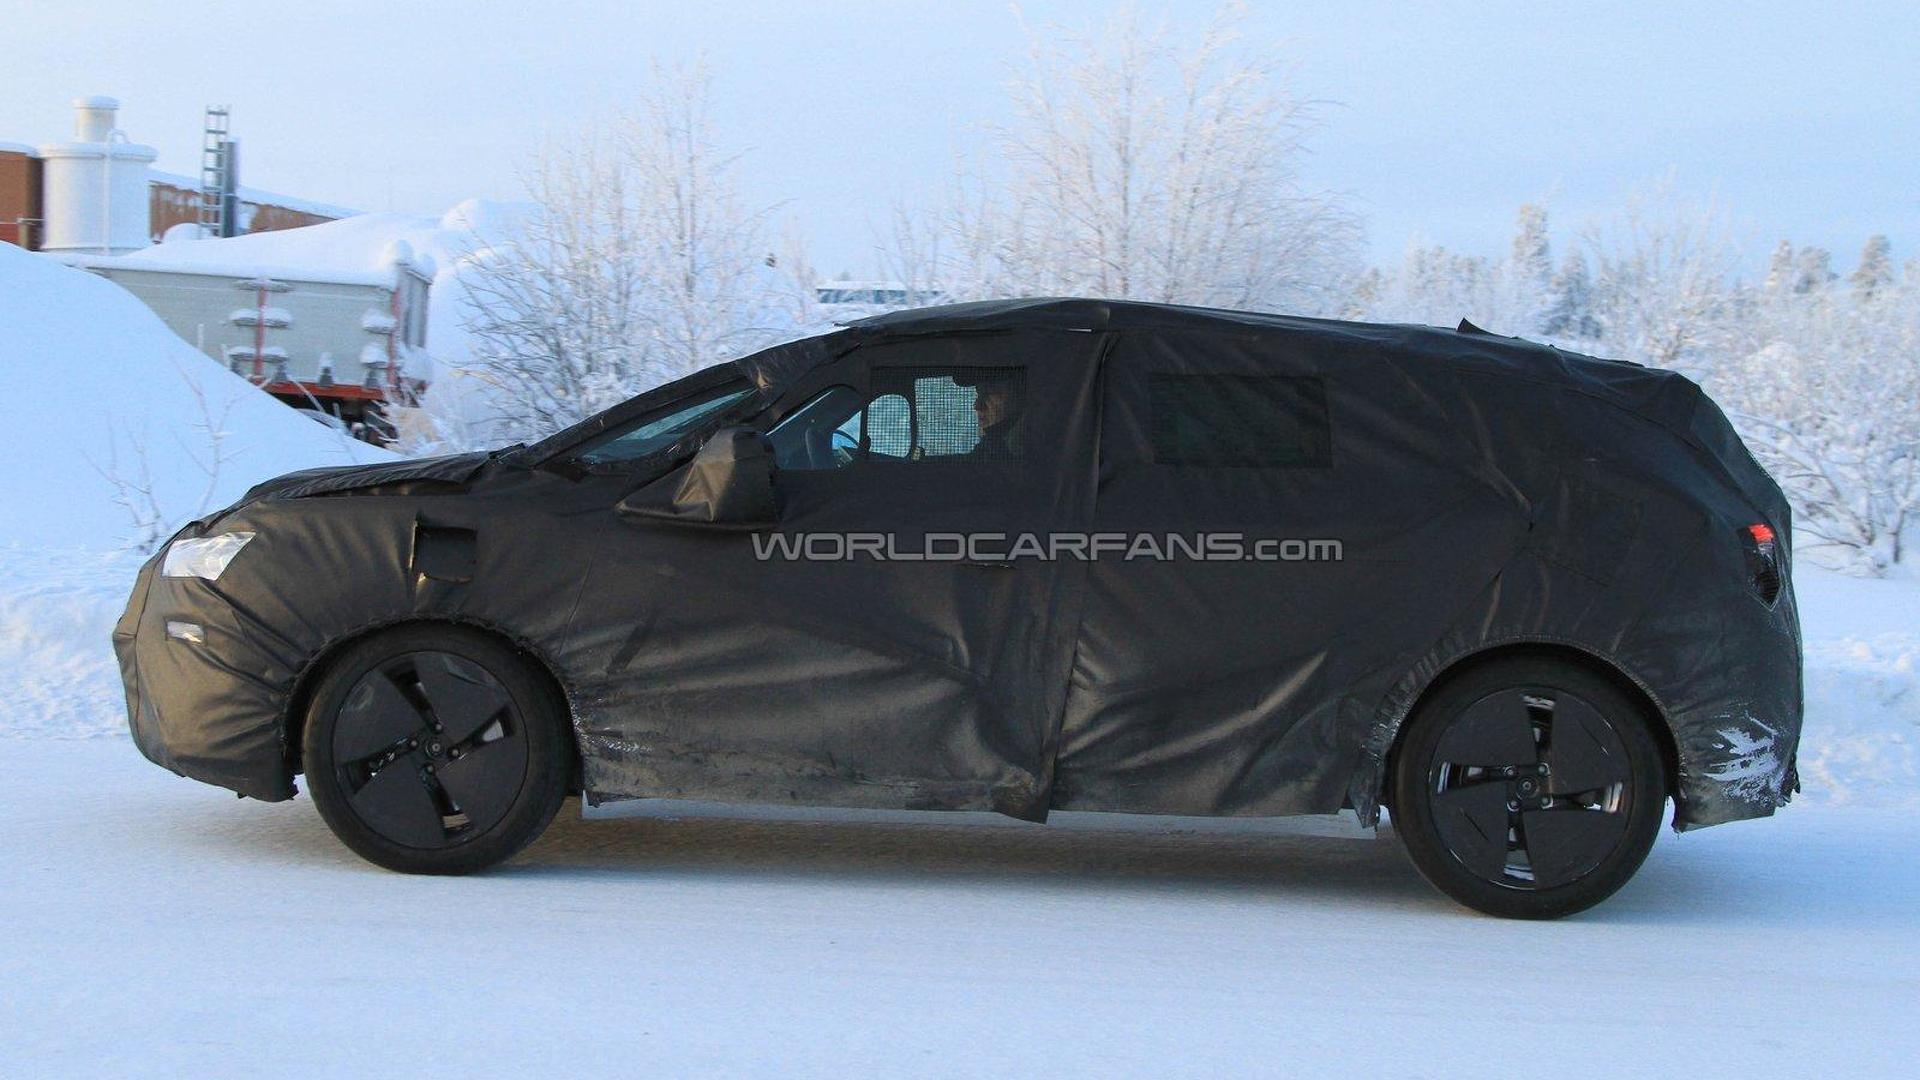 2011 Citroen DS5 spied winter testing